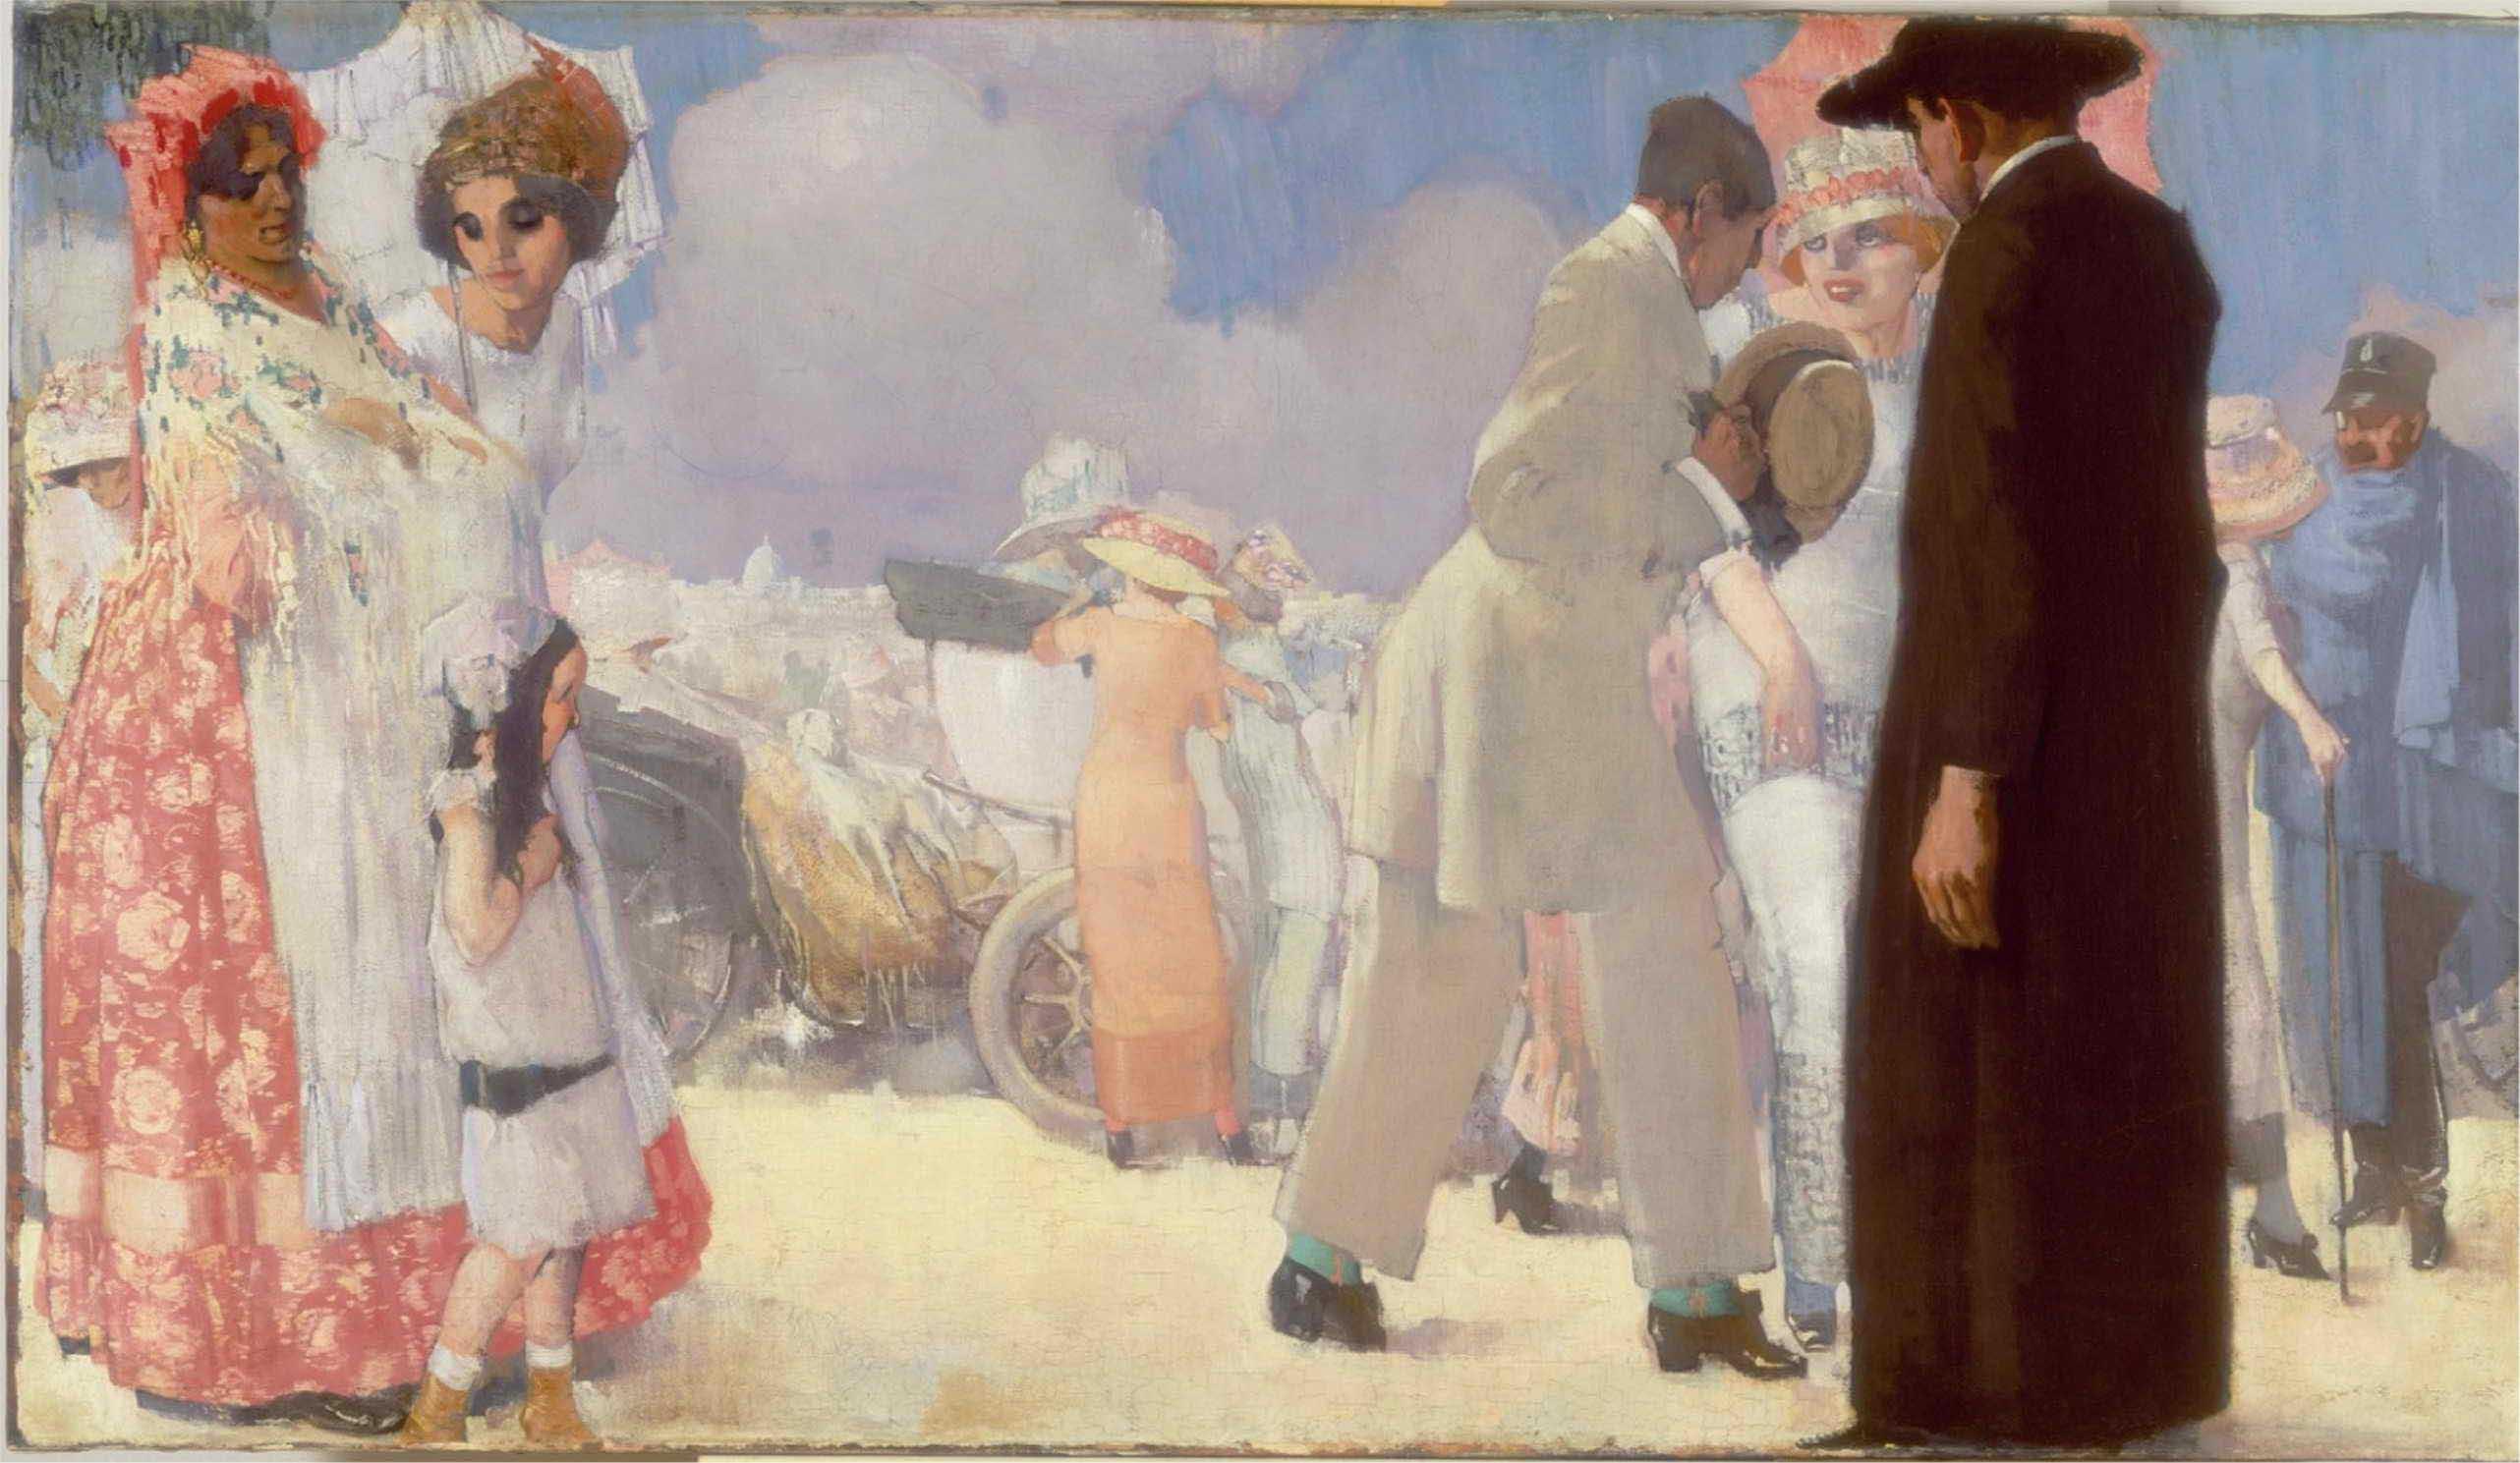 Piet van der Hem, A promenade on the Pincio, Rome, Amsterdam, Stedelijk Museum